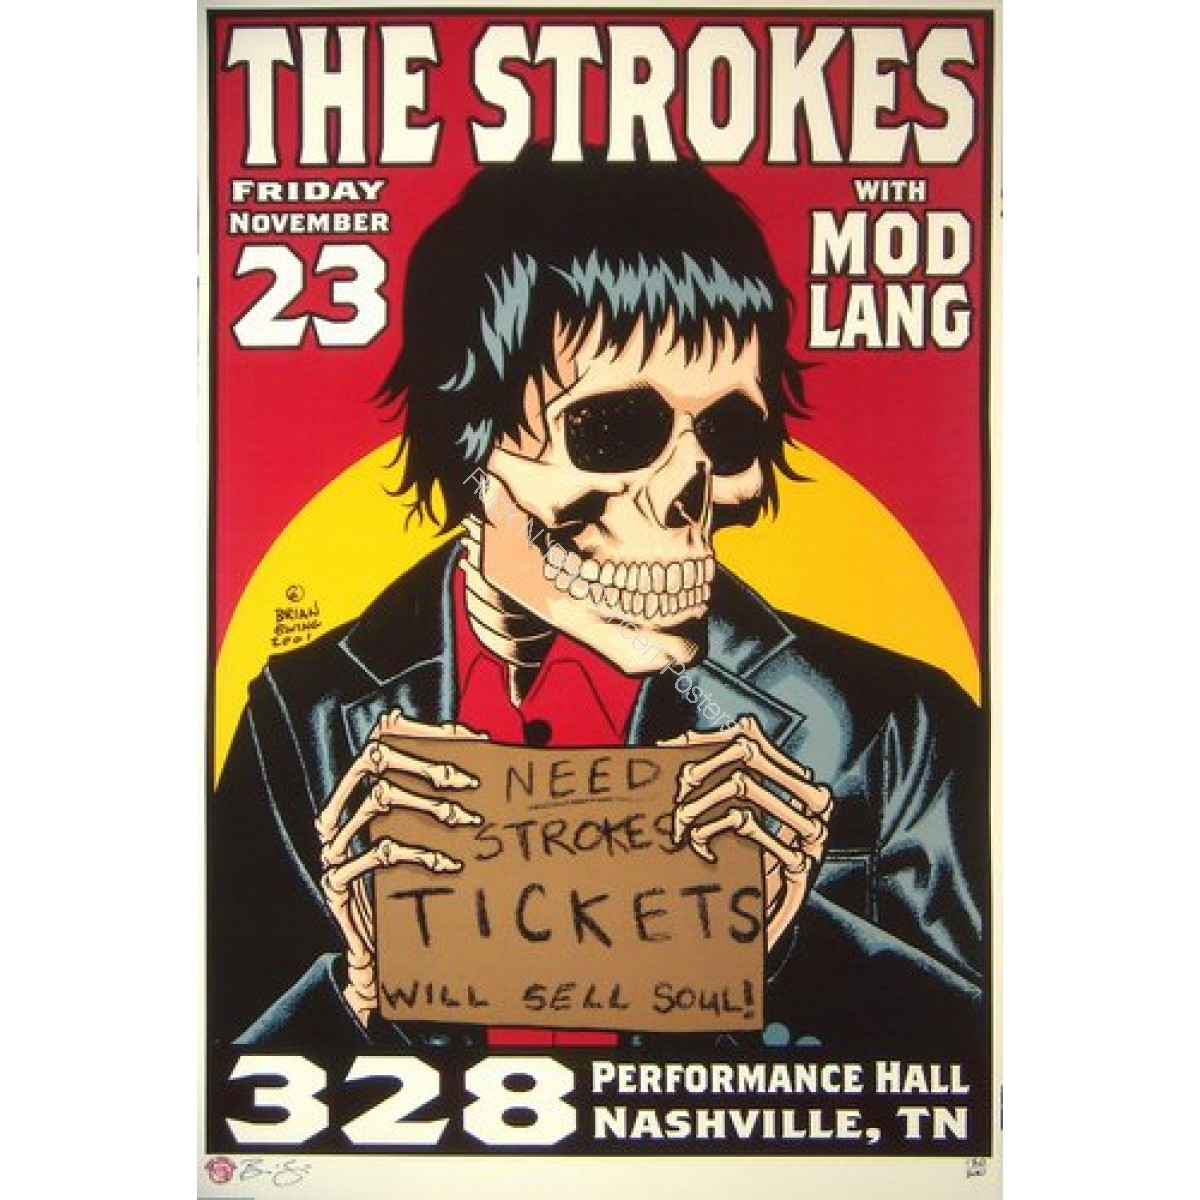 The Strokes @ Performance Halll Nashville TN 11/23/01